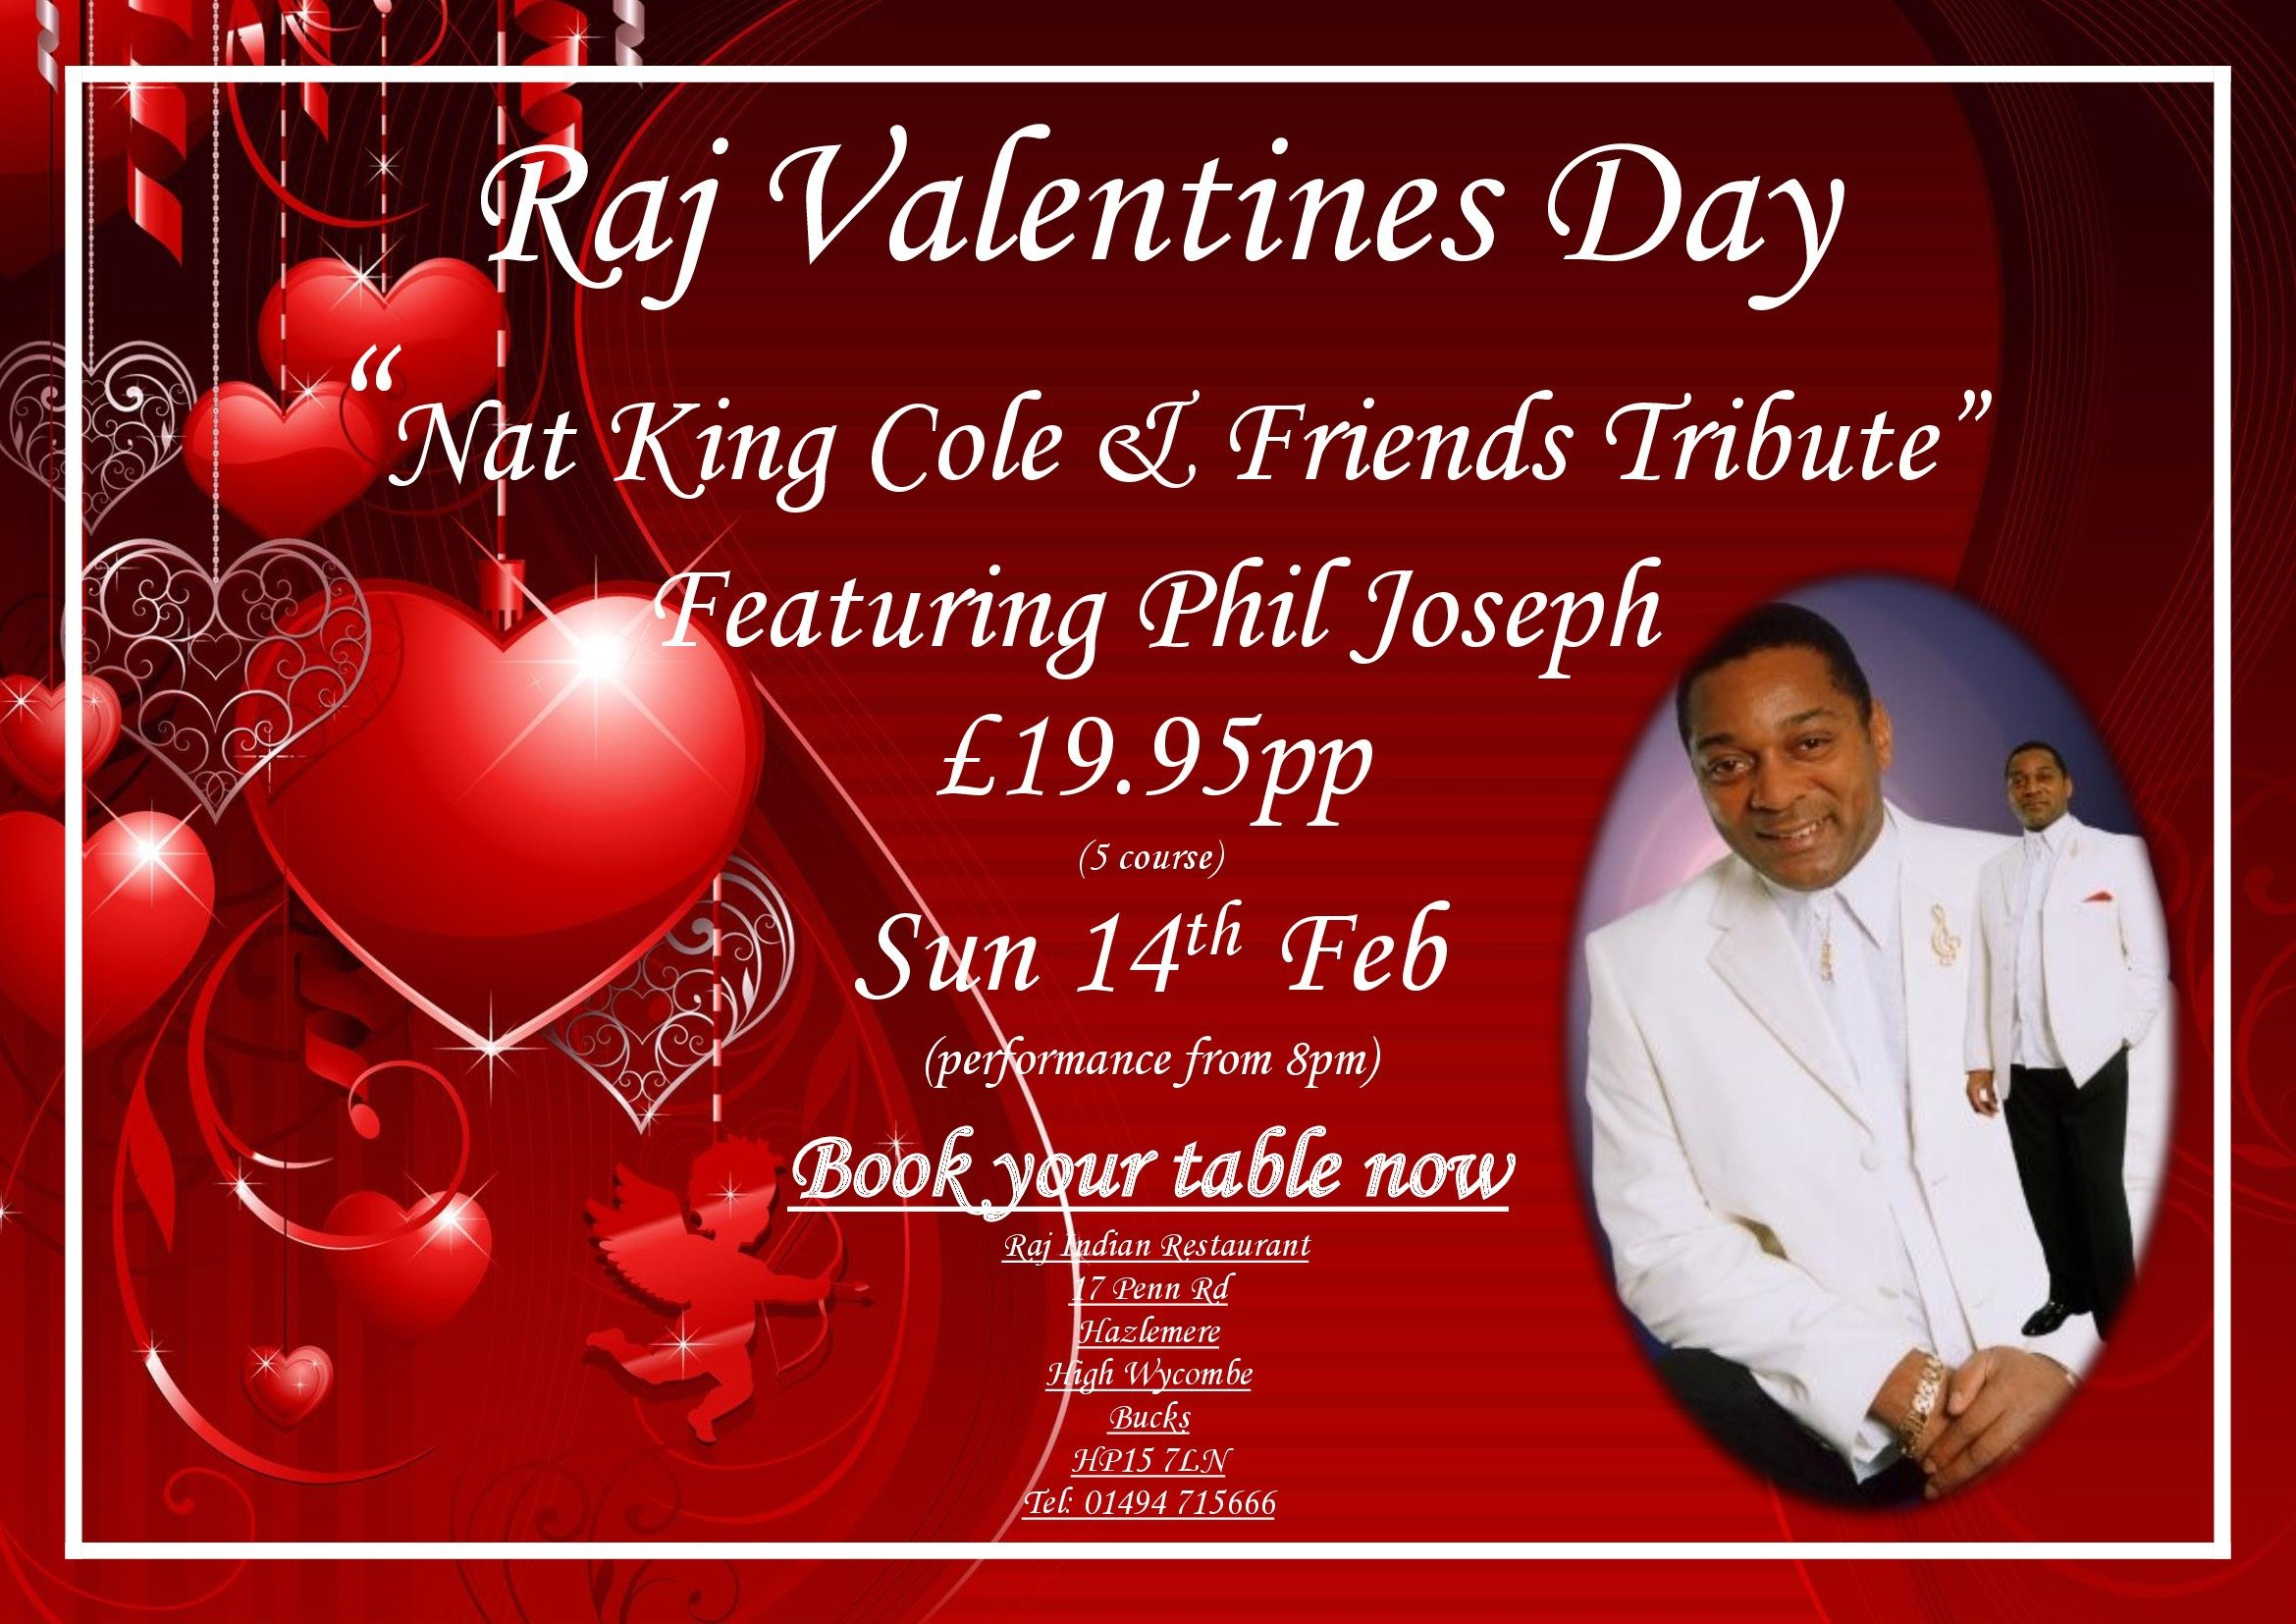 Valentine events